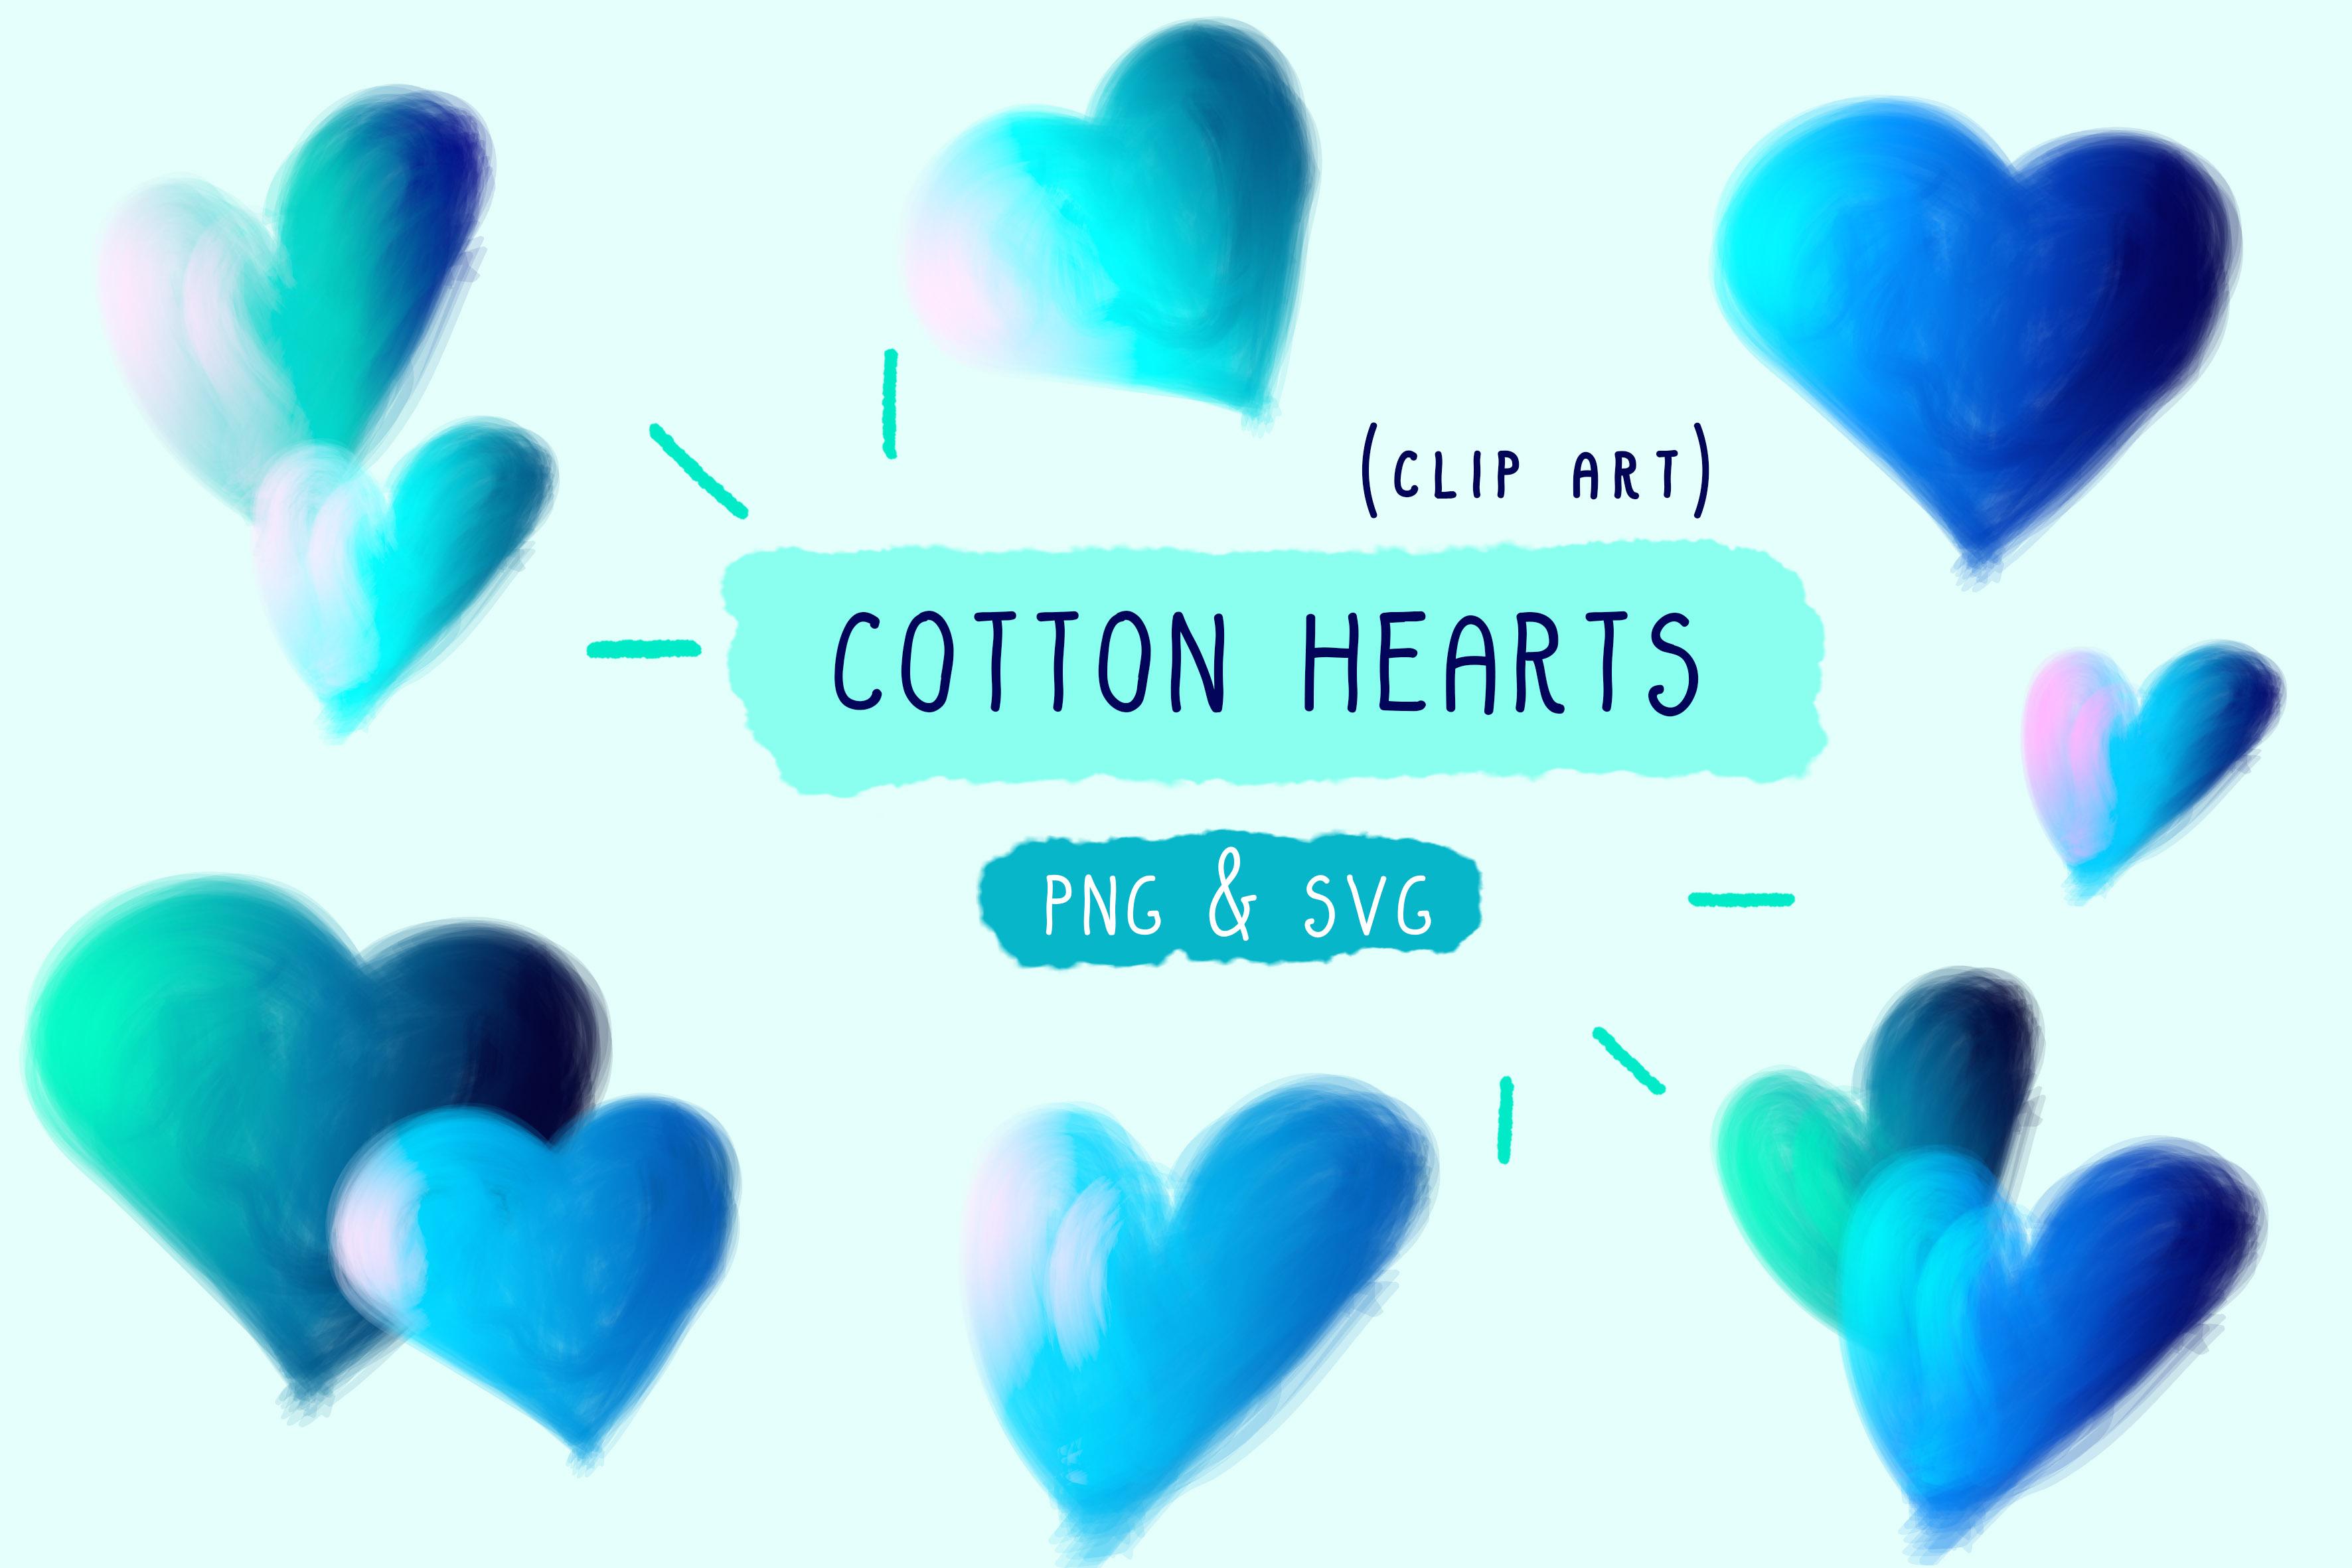 Cotton Candy, Hearts Clip Art, Handmade.